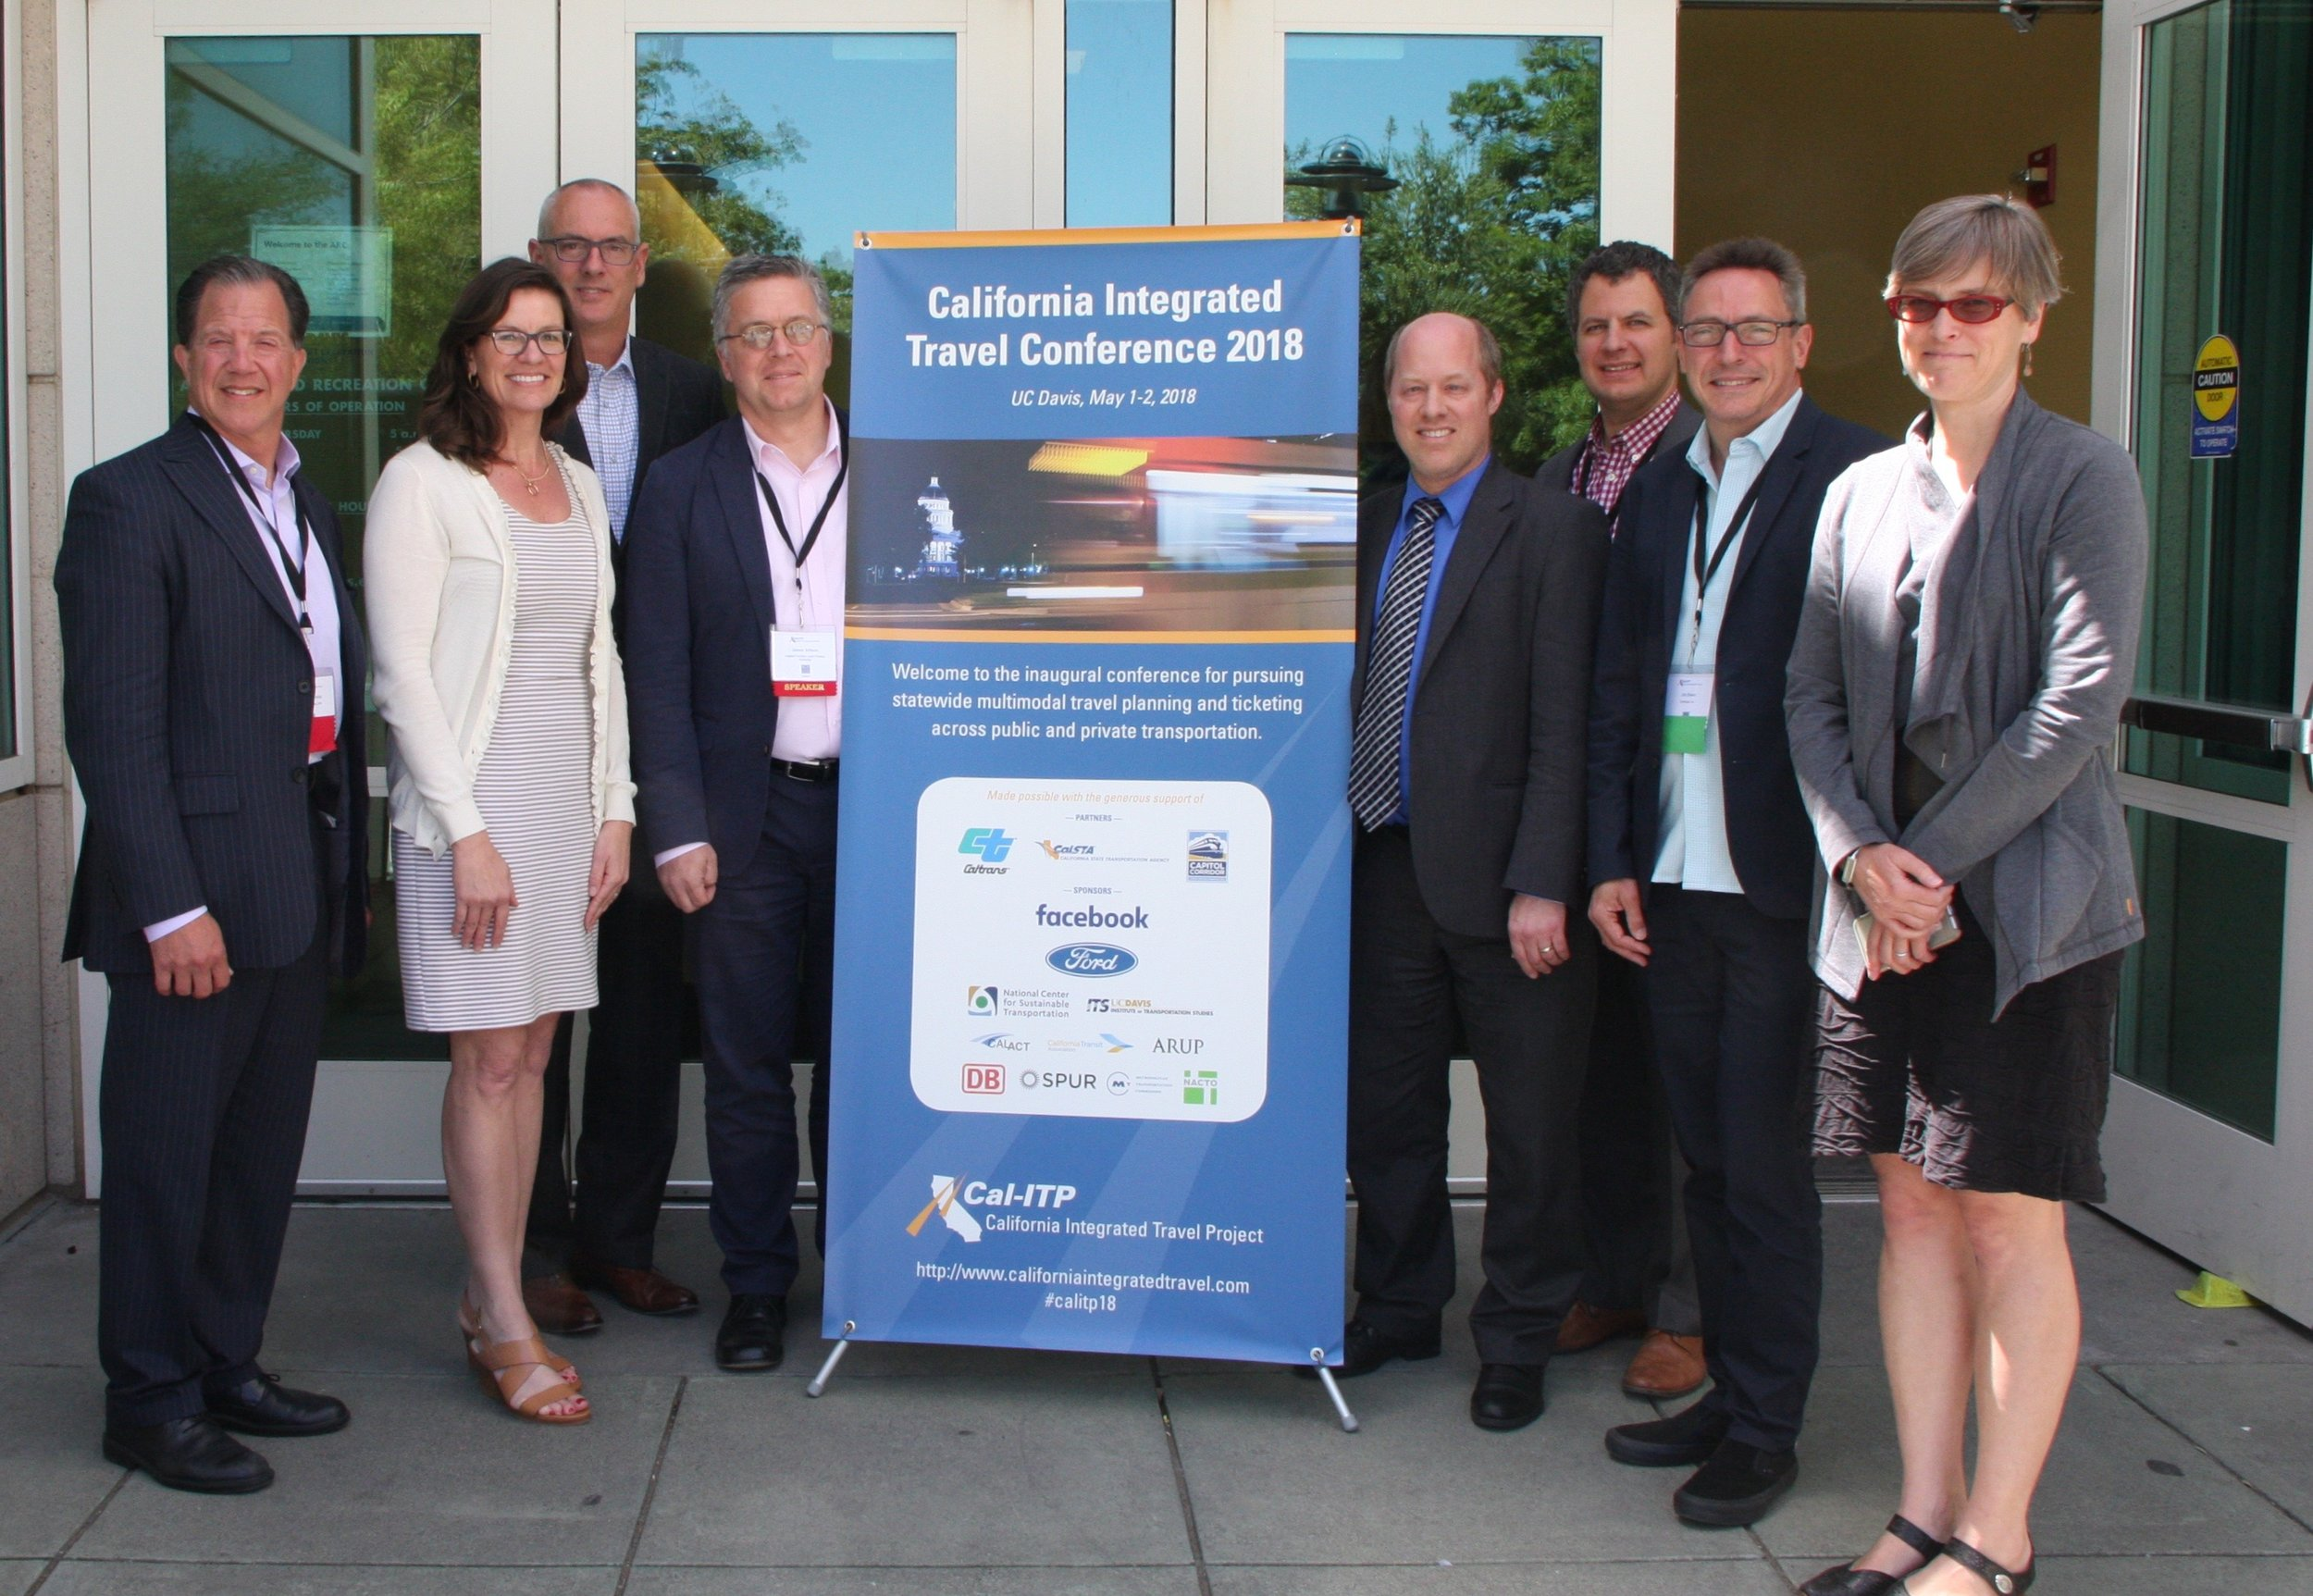 Members of the Cal-ITP Steering & Advisory Committees. (L to R) David Kutrosky, Colleen Richter, Josh Shaw, Jim Allison, Chad Edison, Kyle Gradinger, Jim Baker, and Gillian Gillet.